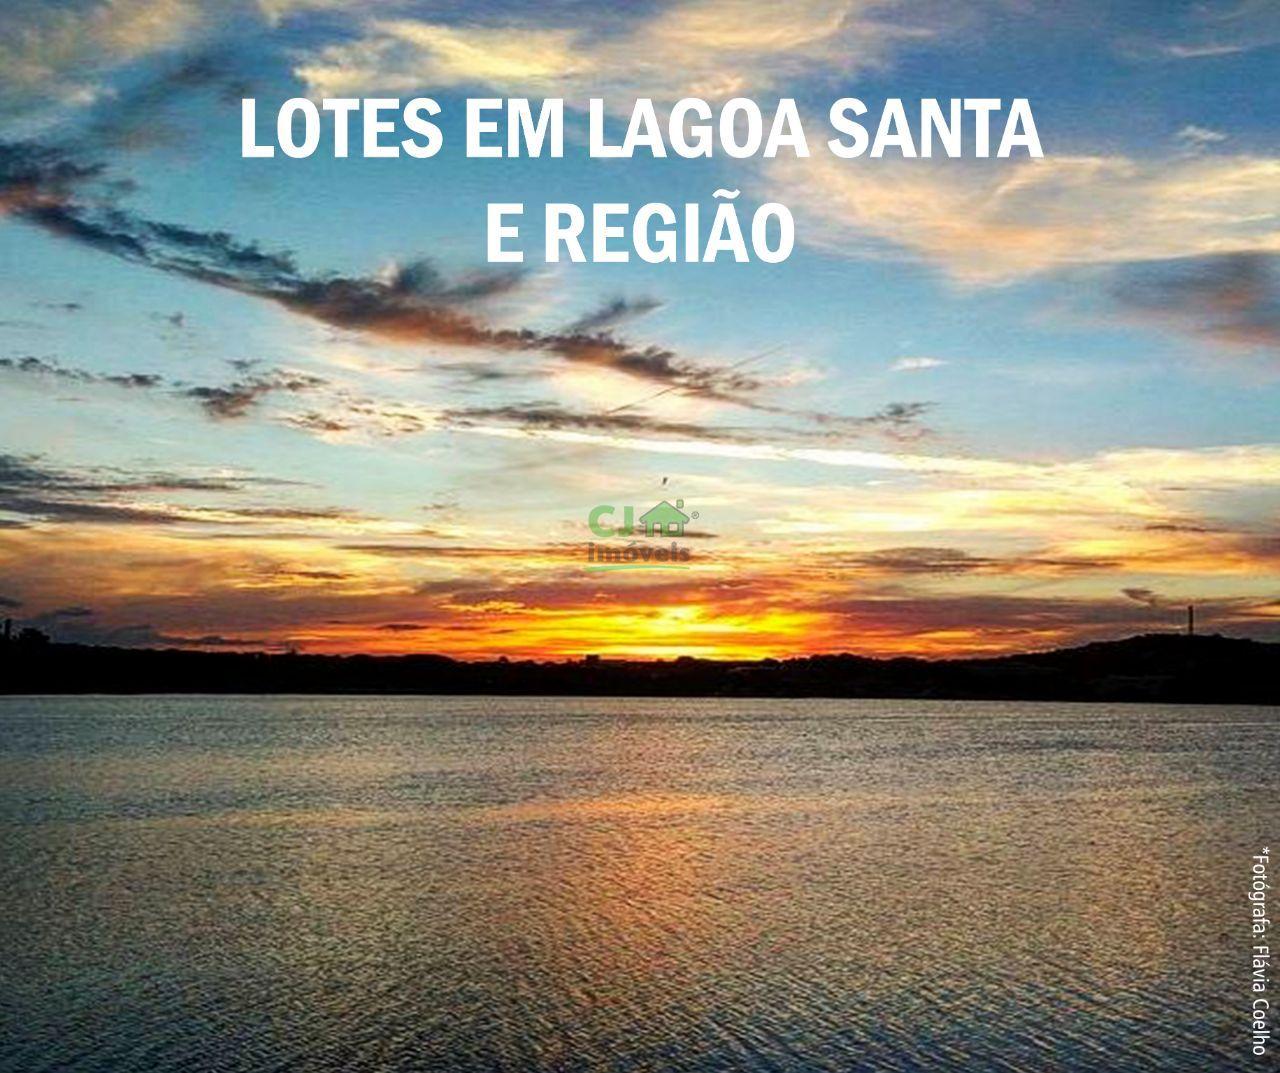 Lote - Presidente - Matozinhos